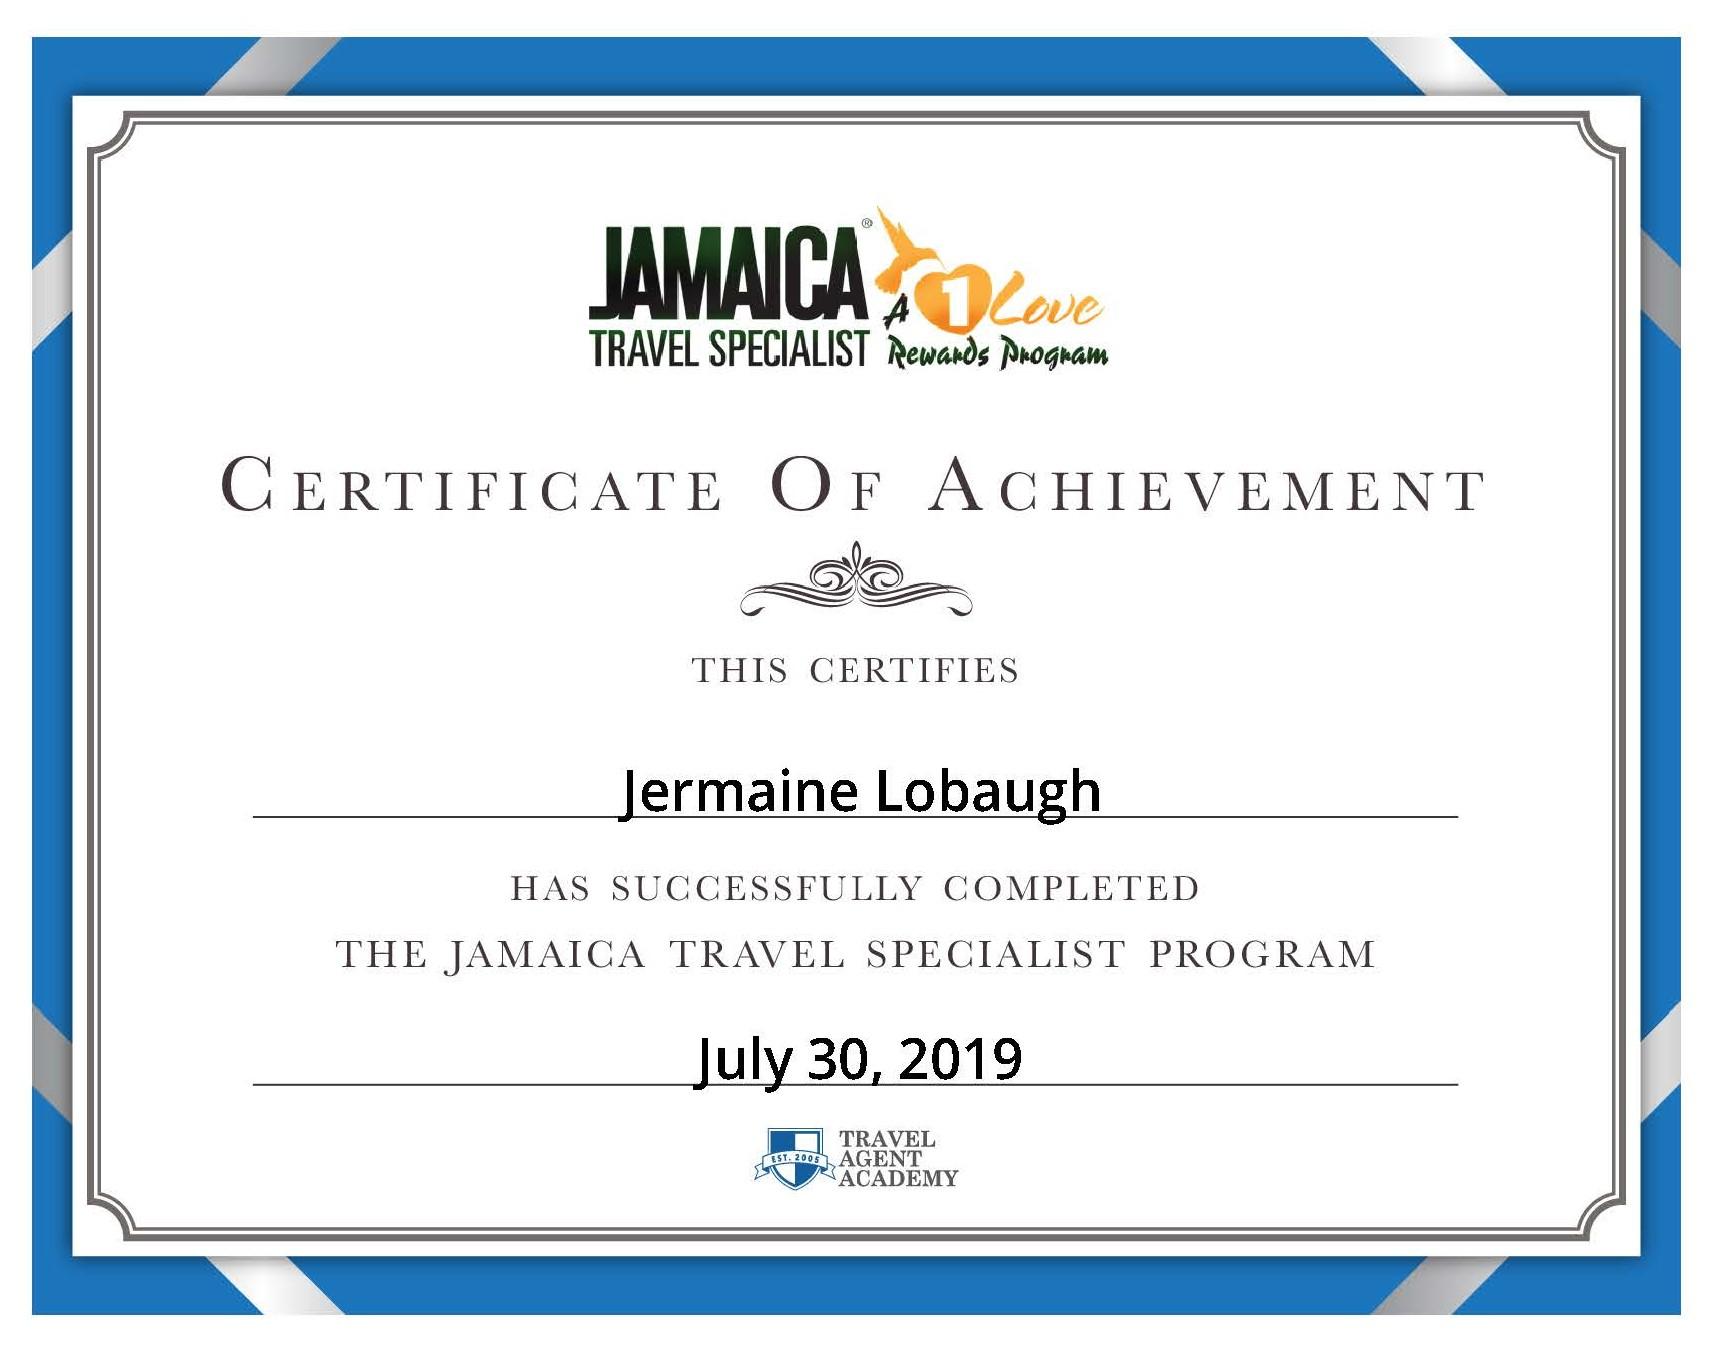 Jamaica Travel Specialist Program.jpg